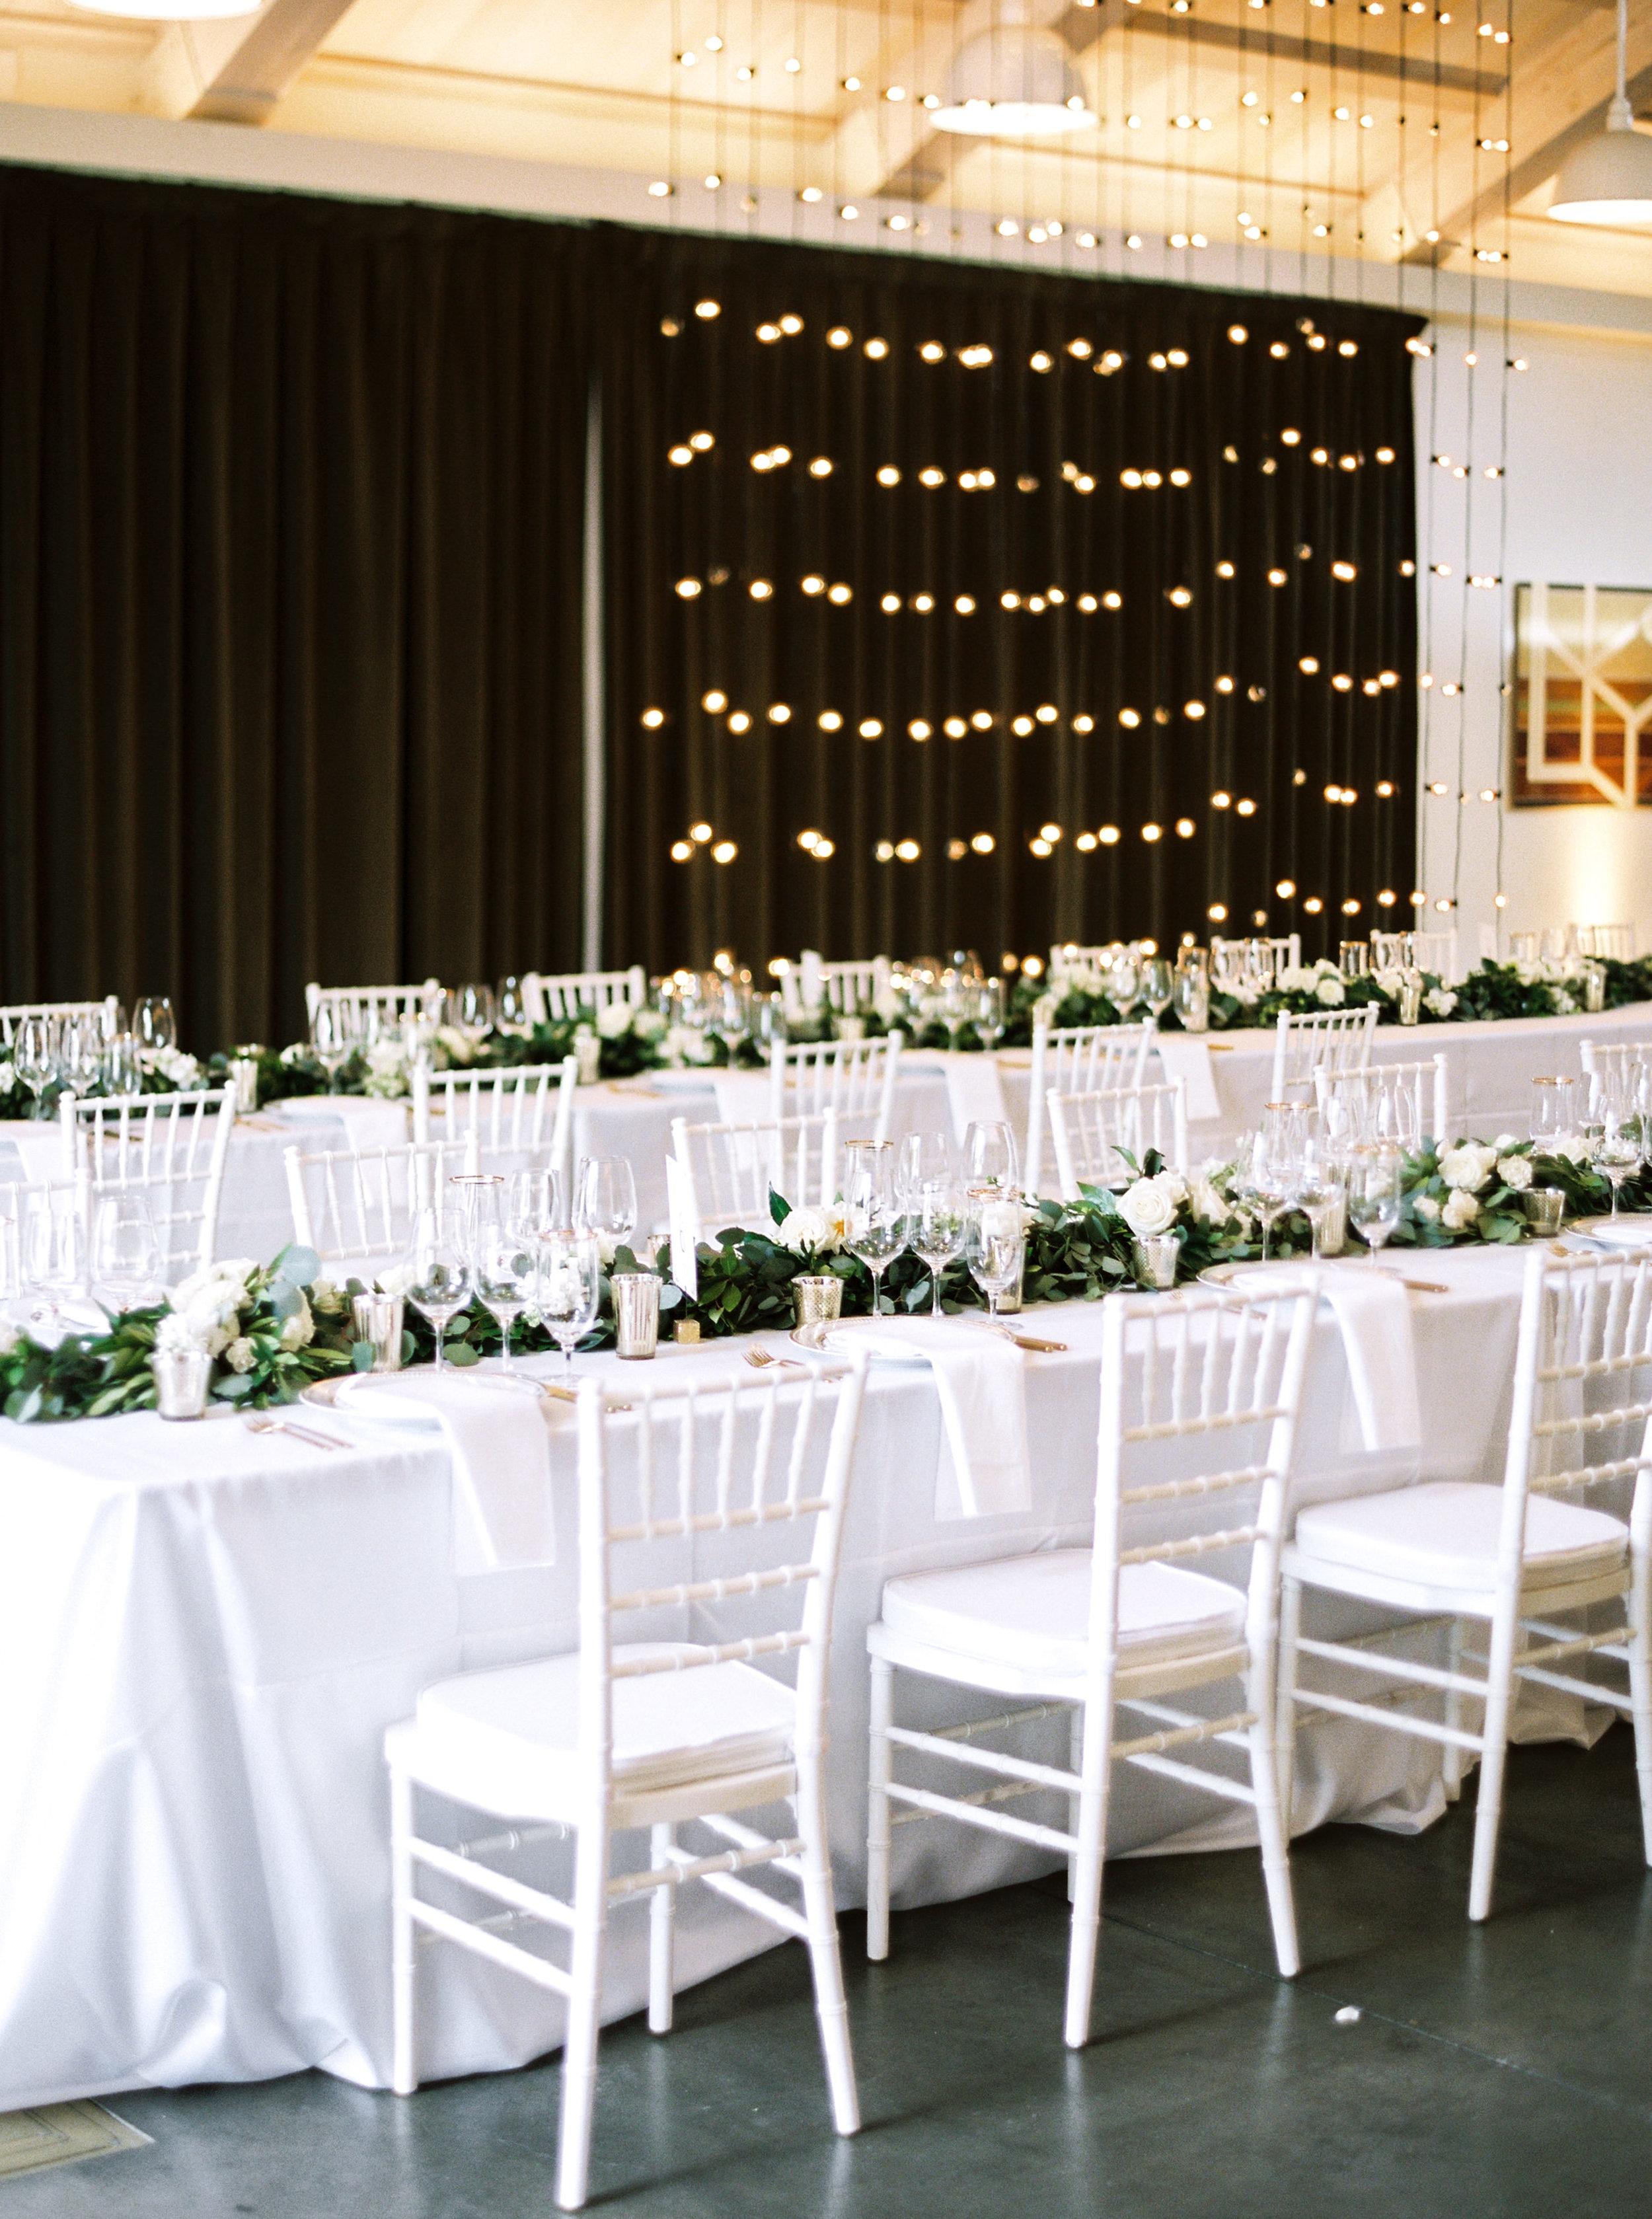 intimate-wedding-at-solage-calistoga-in-napa-185.jpg